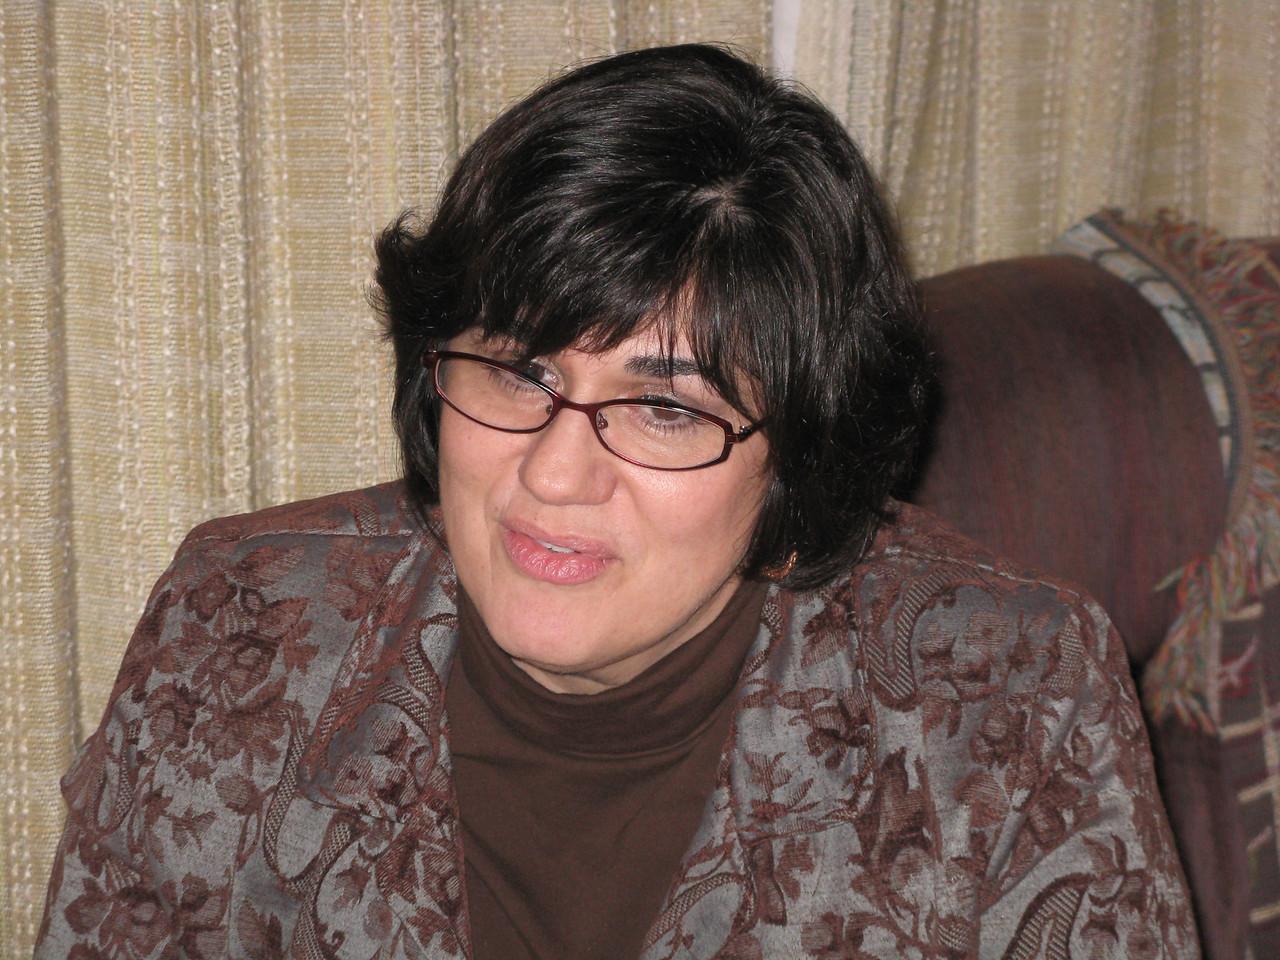 Sherry Krainick, Martin's cousin Jim's ex-wife.